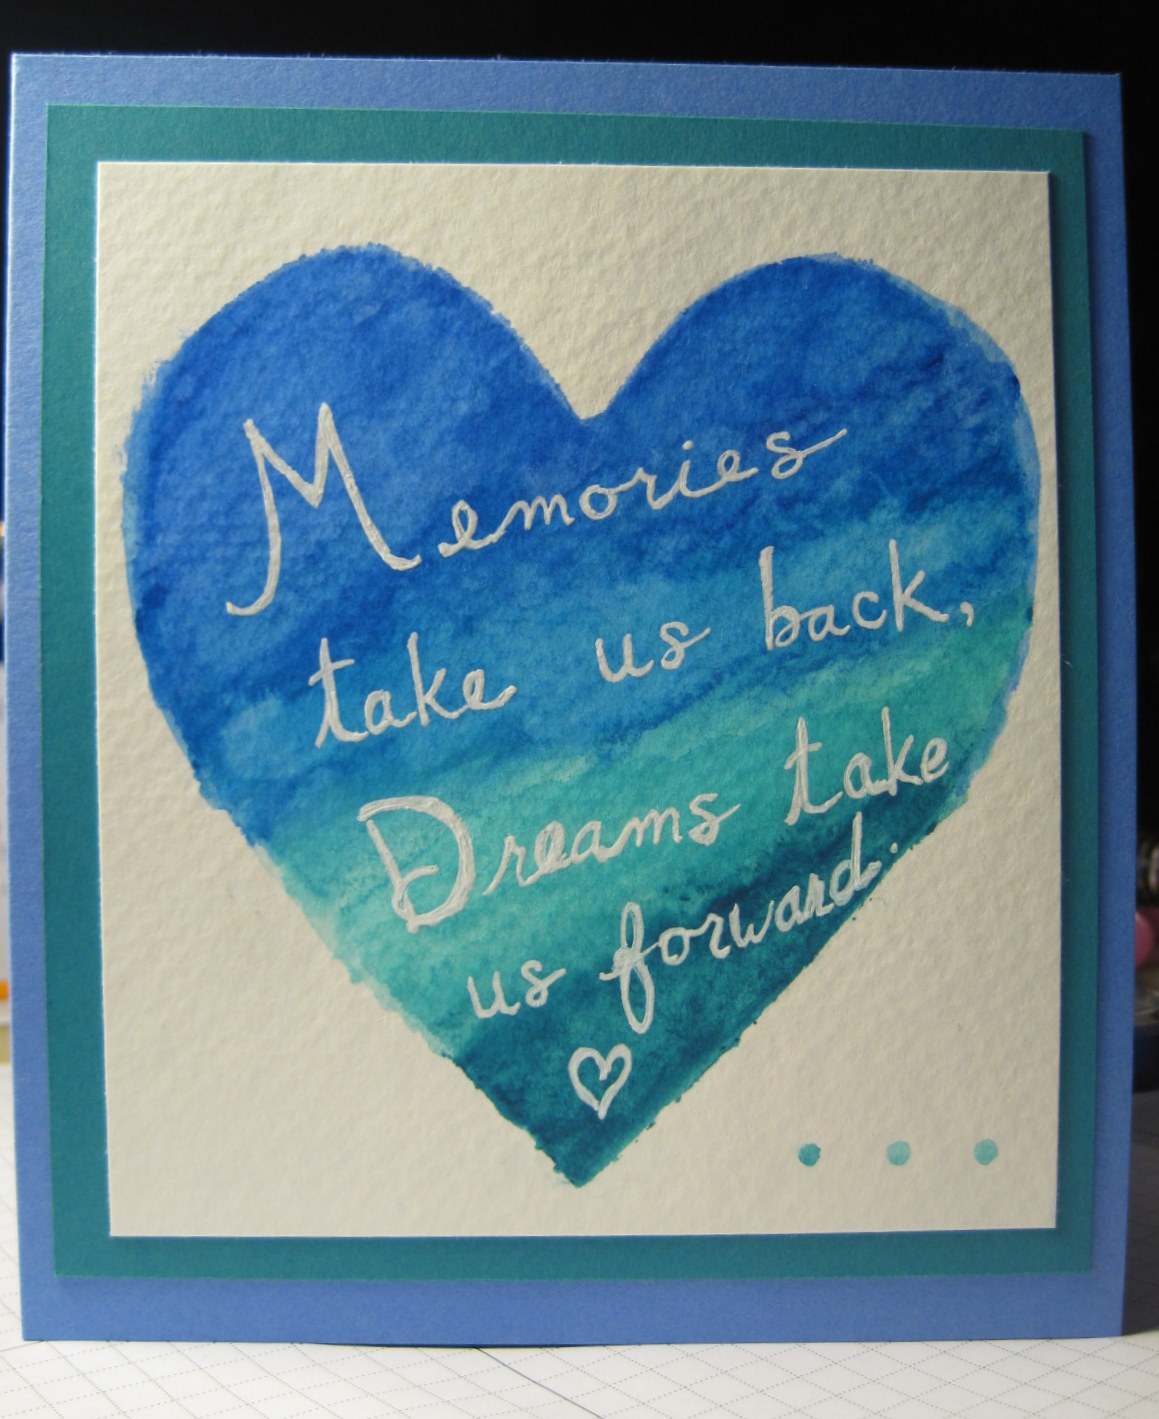 Memories & Dreams